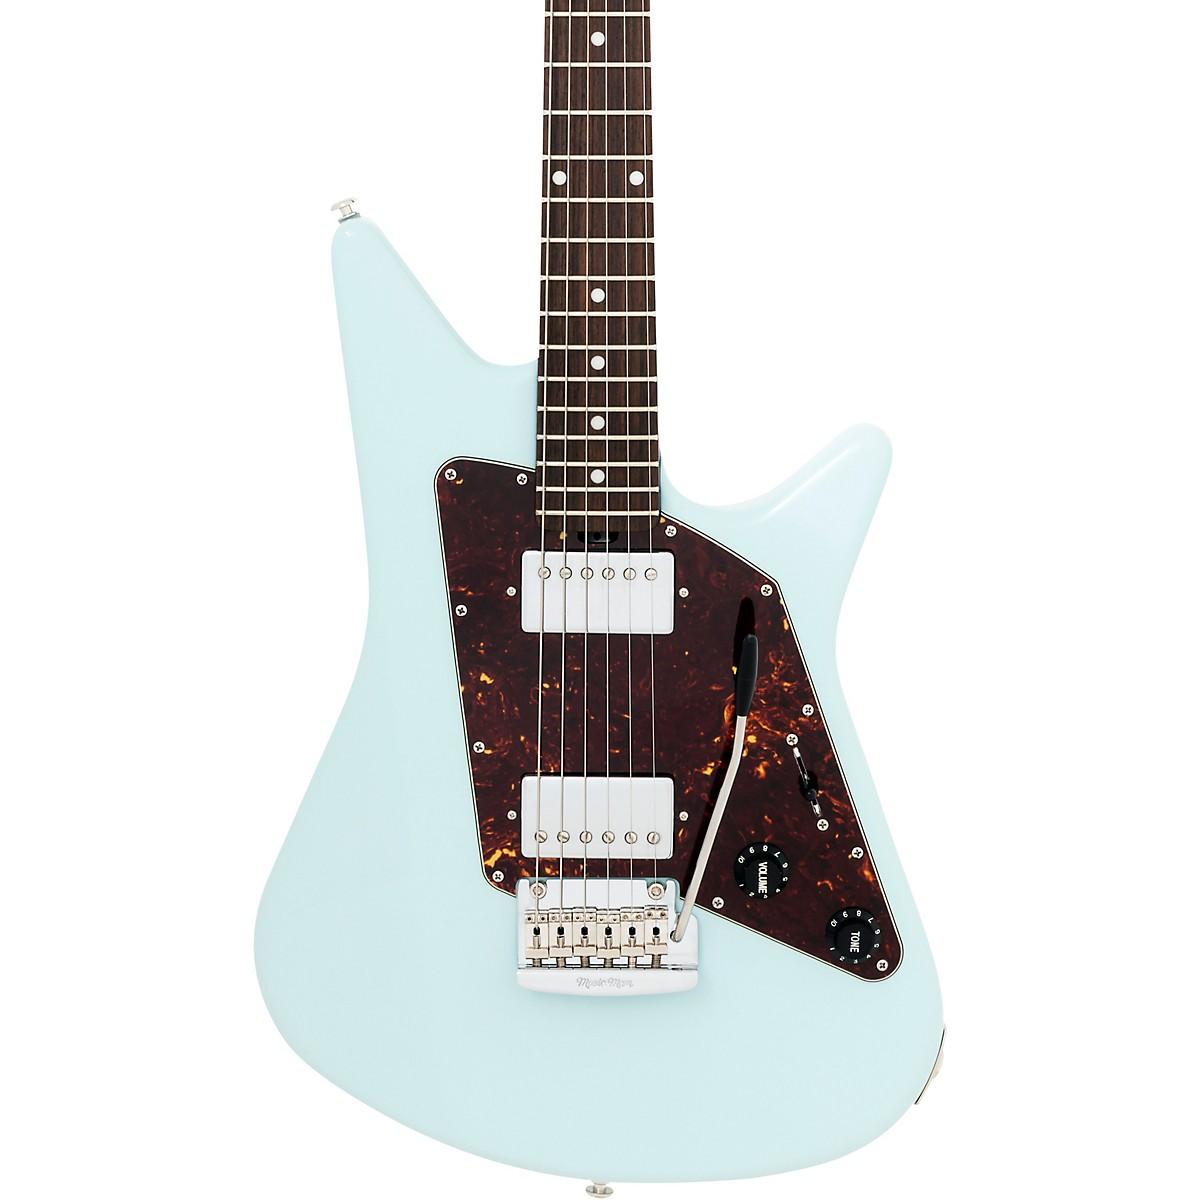 Ernie Ball Music Man Albert Lee HH Rosewood Neck Electric Guitar